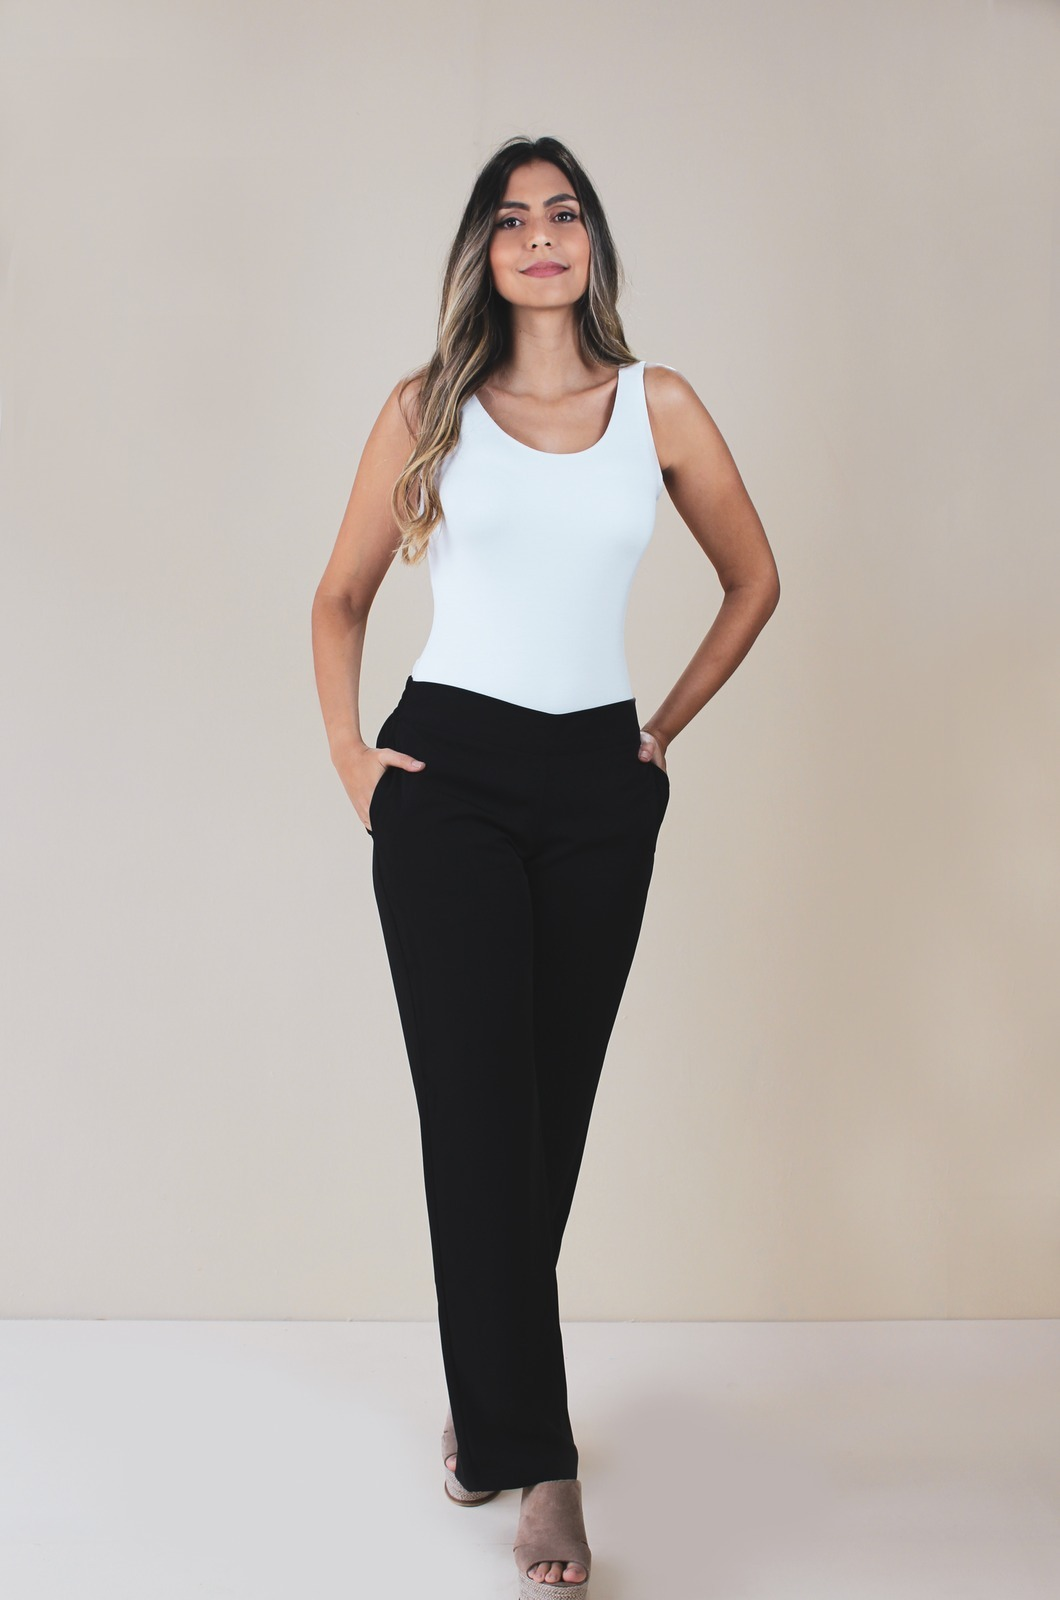 Pantalón bota ancha - Chazari 1290-9 Negro 01